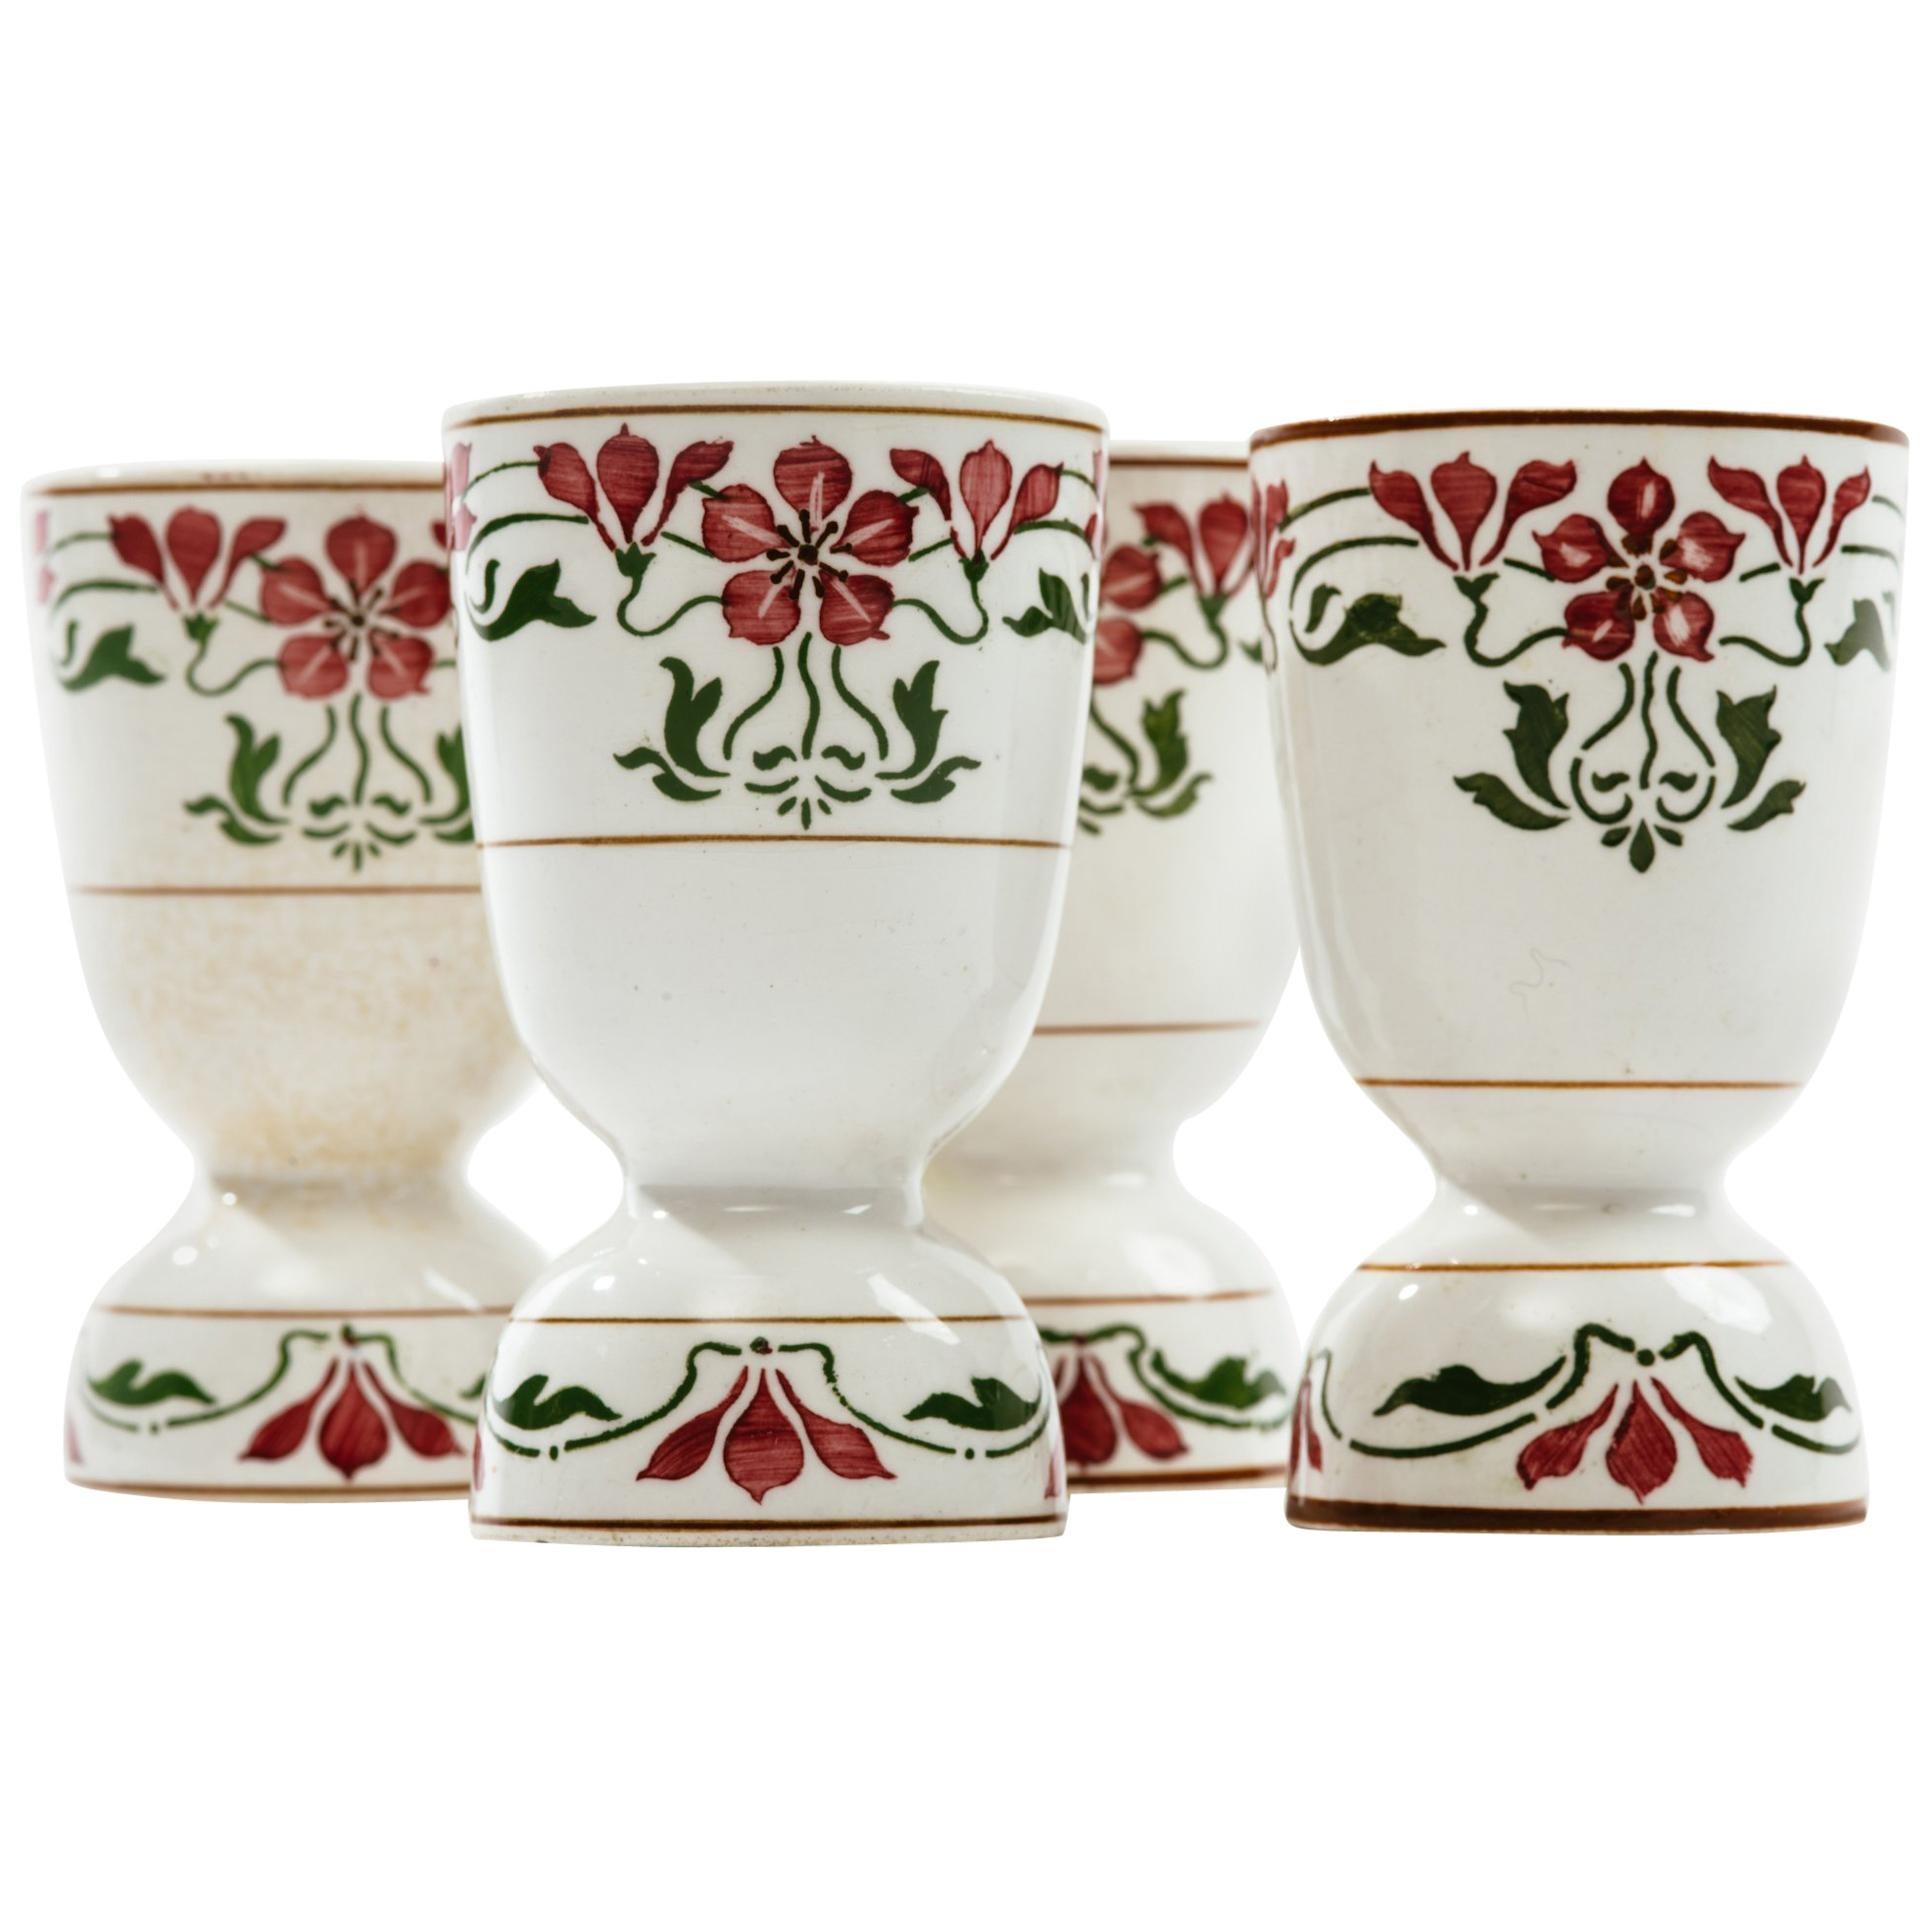 Art Nouveau Villeroy and Boch Saxony Poppy Porcelain Egg Cups